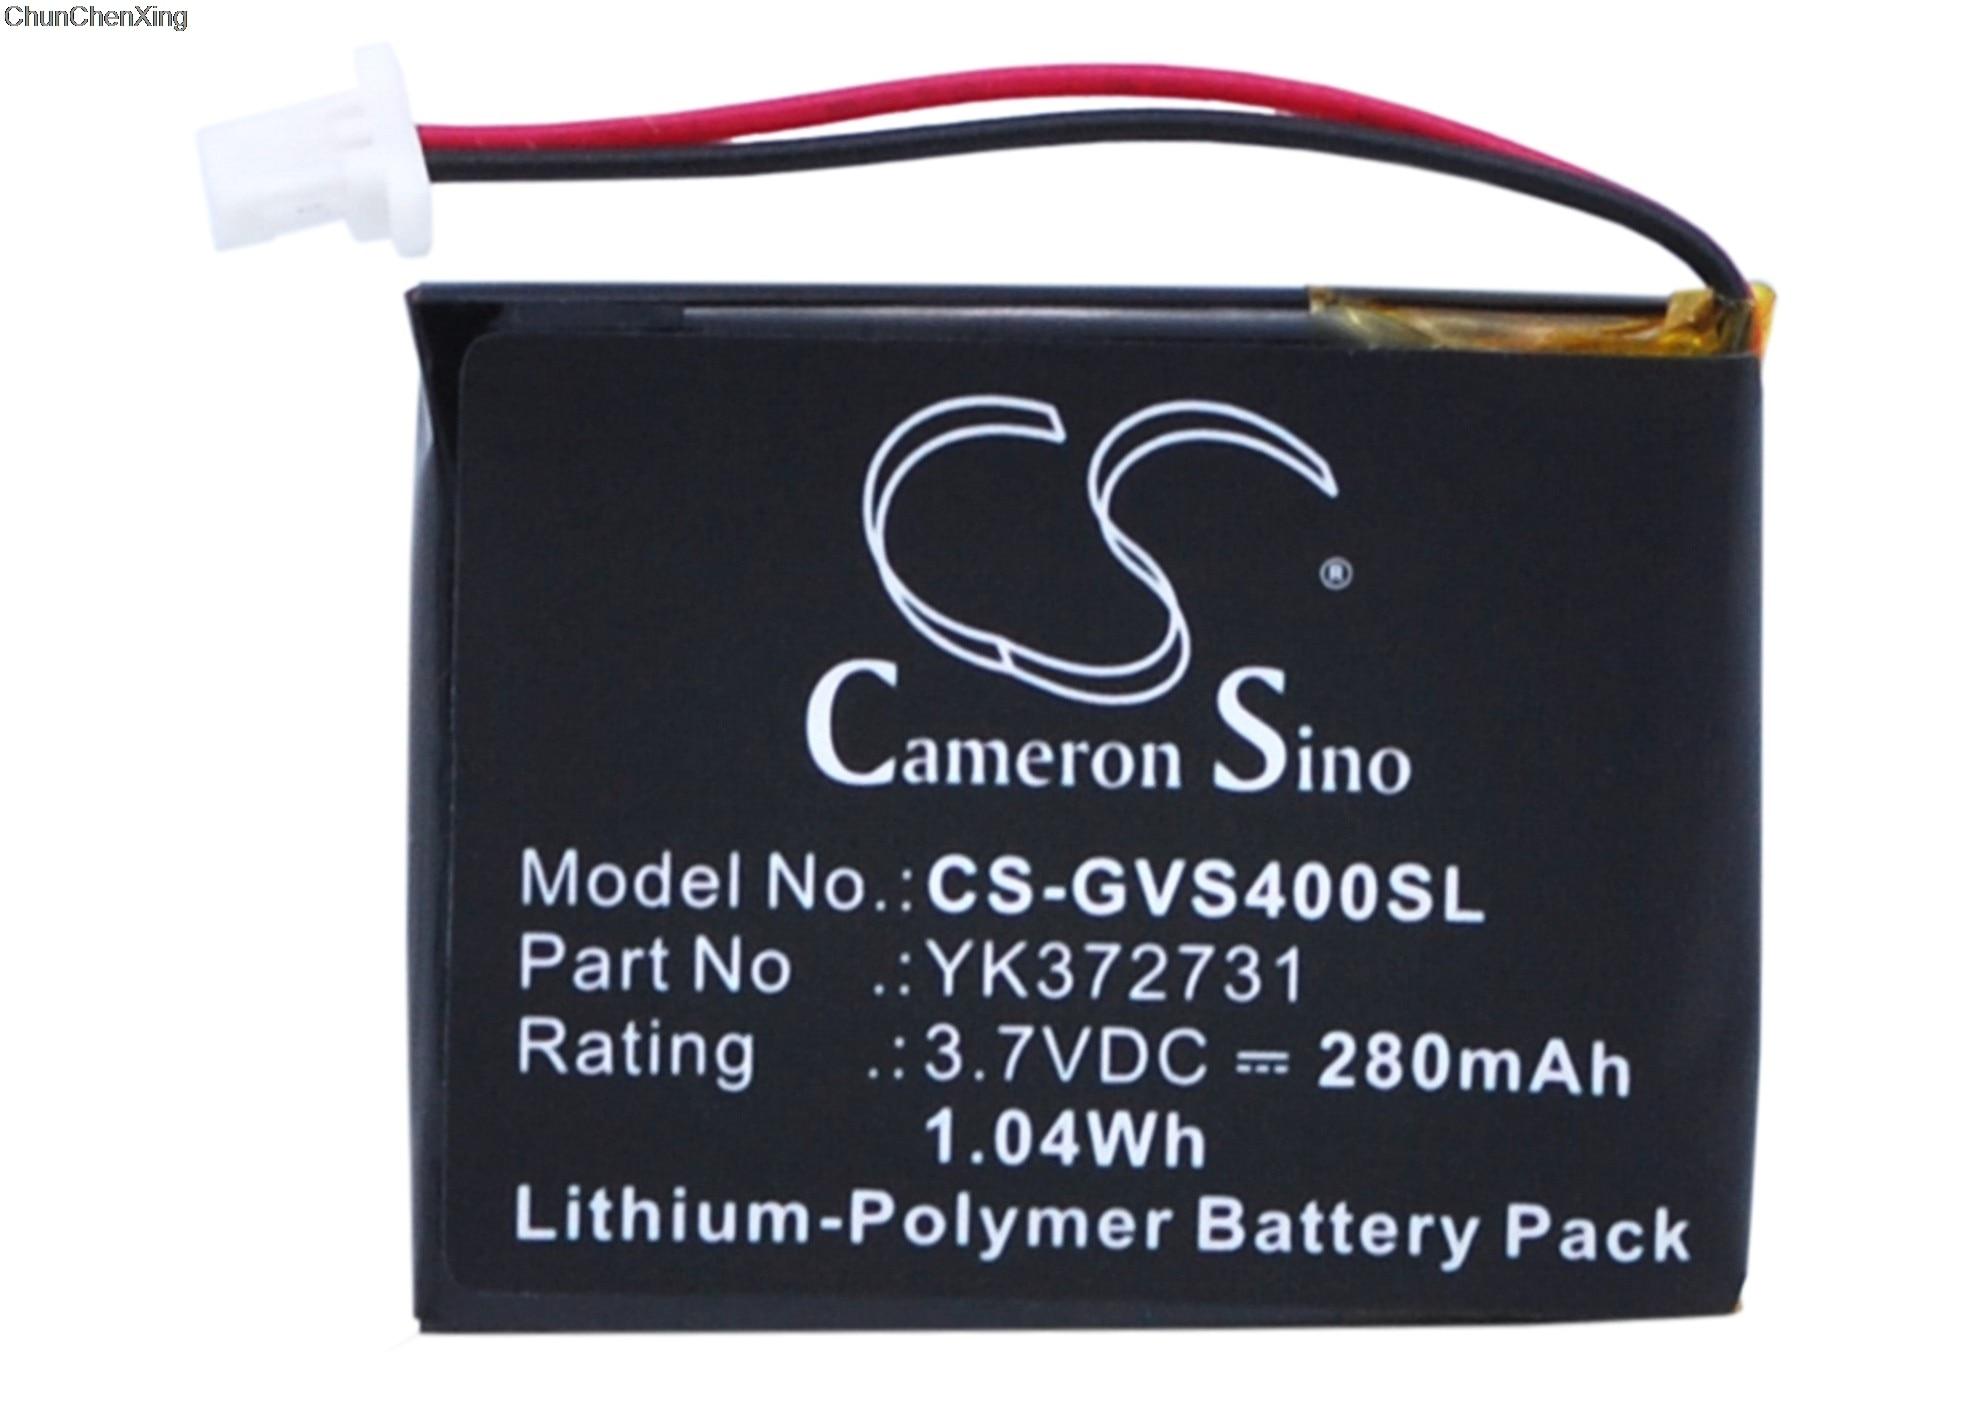 Batería de 280mAh Cameron Sino para Golf Buddy GB750, GB900, Voz 2, voz GPS telémetro, voz Plus, VS4 GPS telémetro, voz VS4